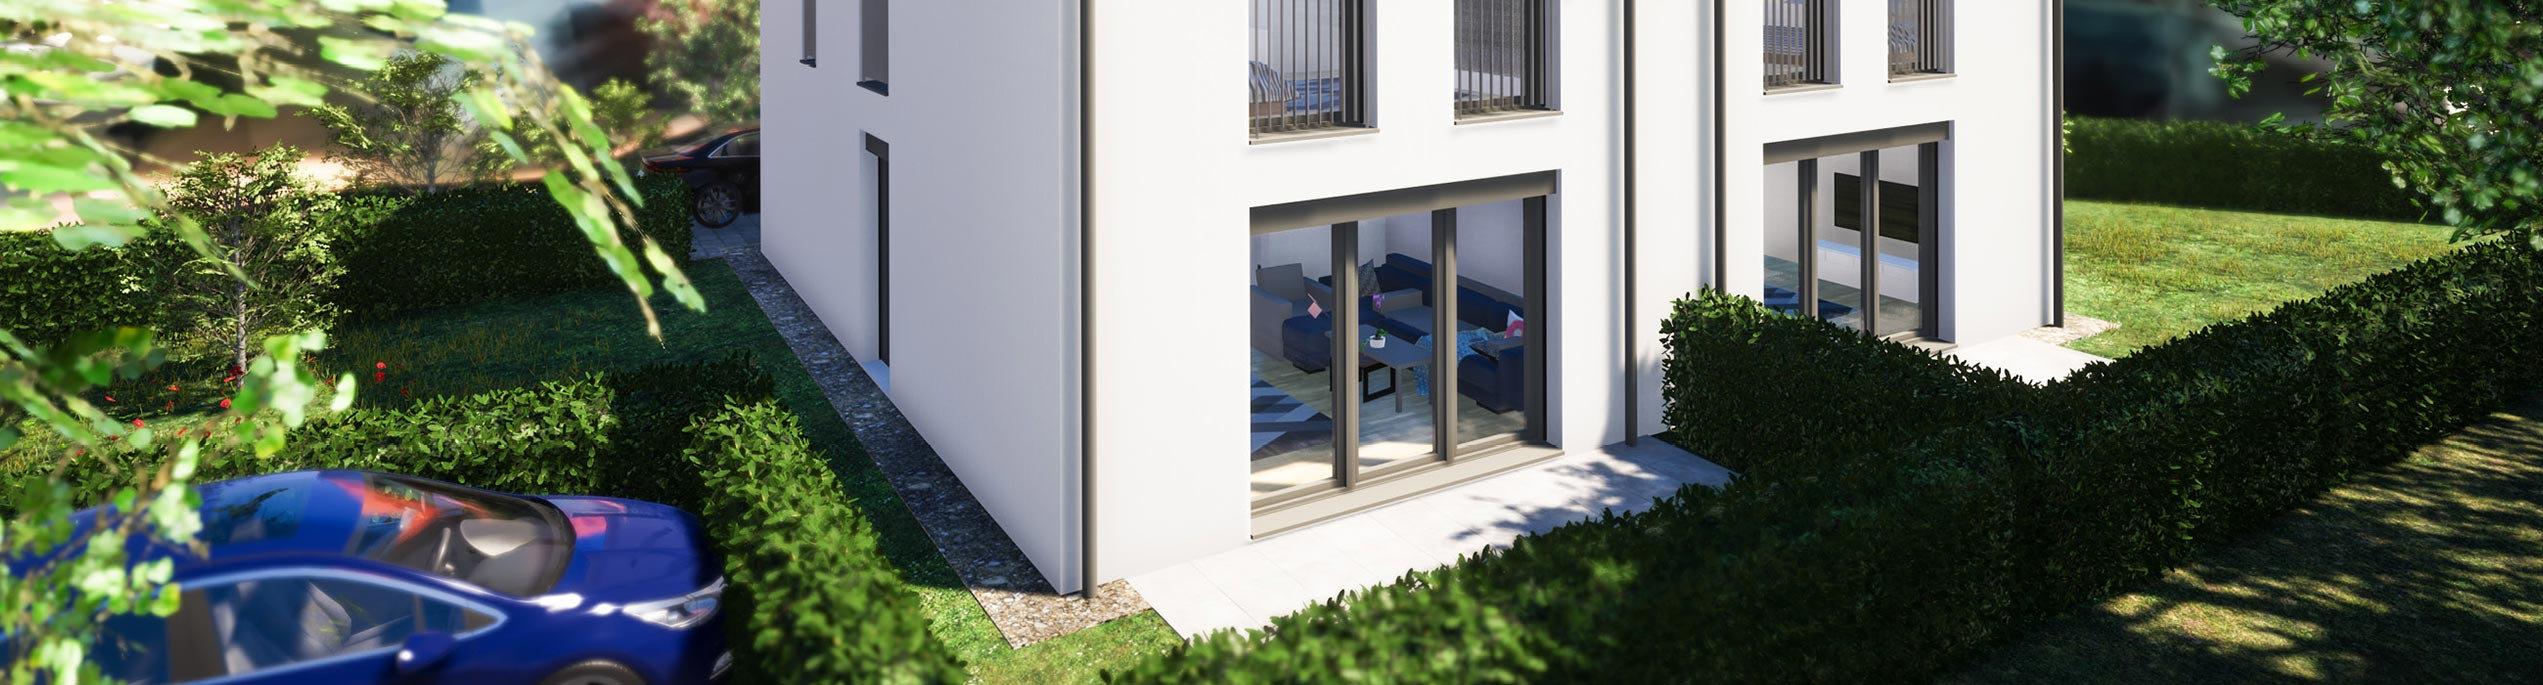 H-Verkauf-Haus_Doppelhaus_Nürnberg-Reic